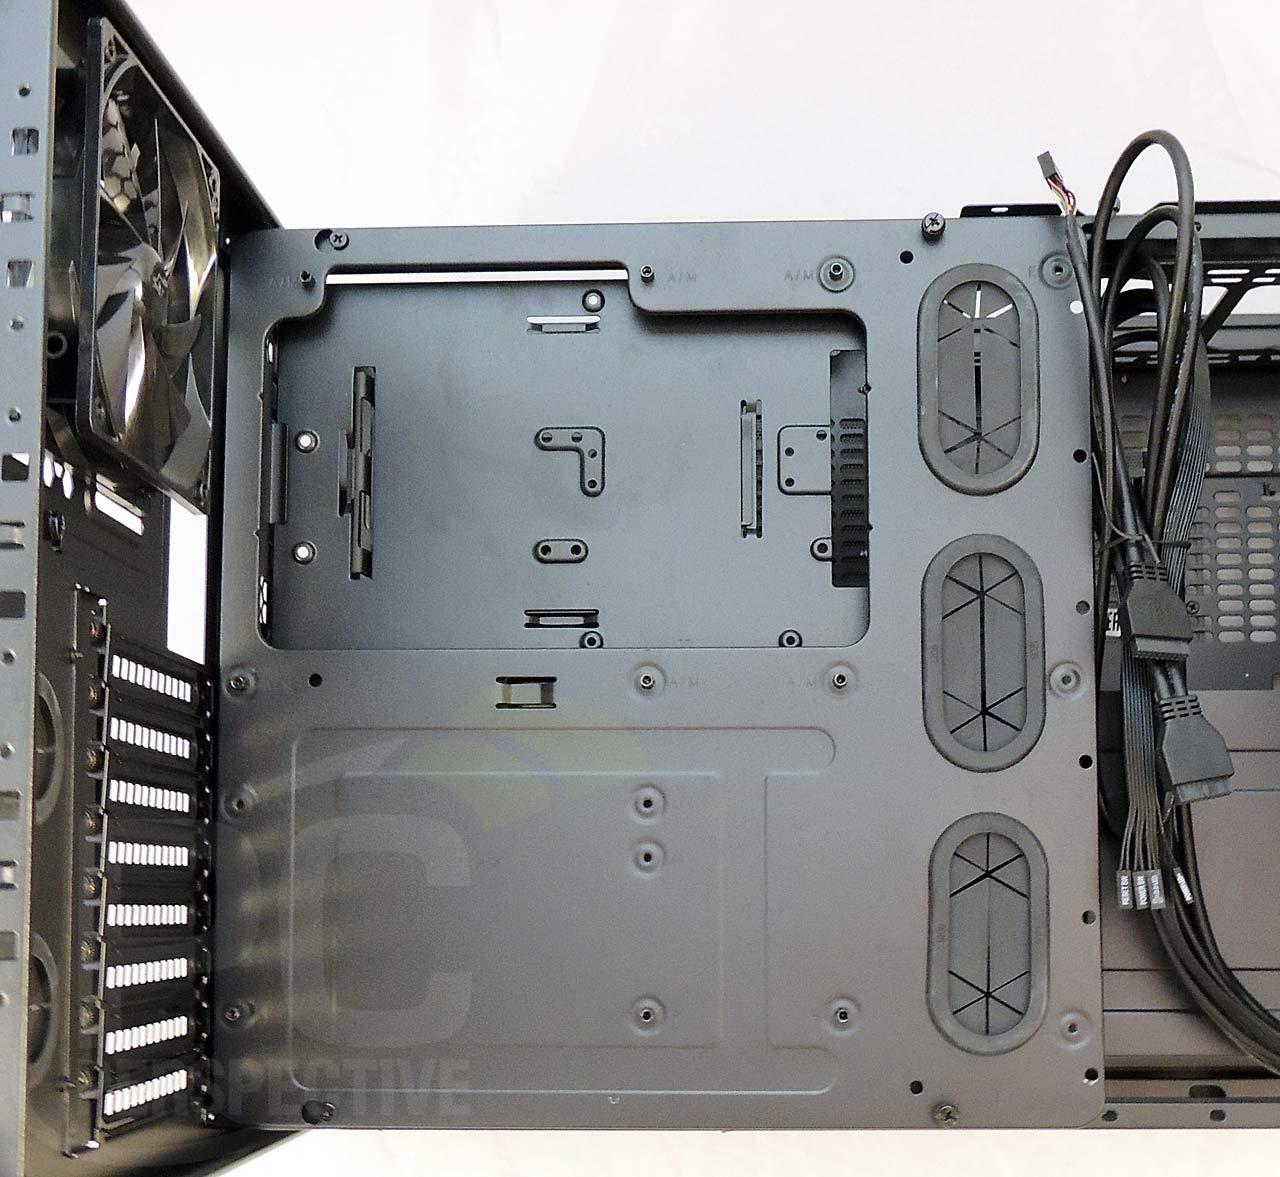 05-case-nopanels-top-mbtray-closeup-1.jpg